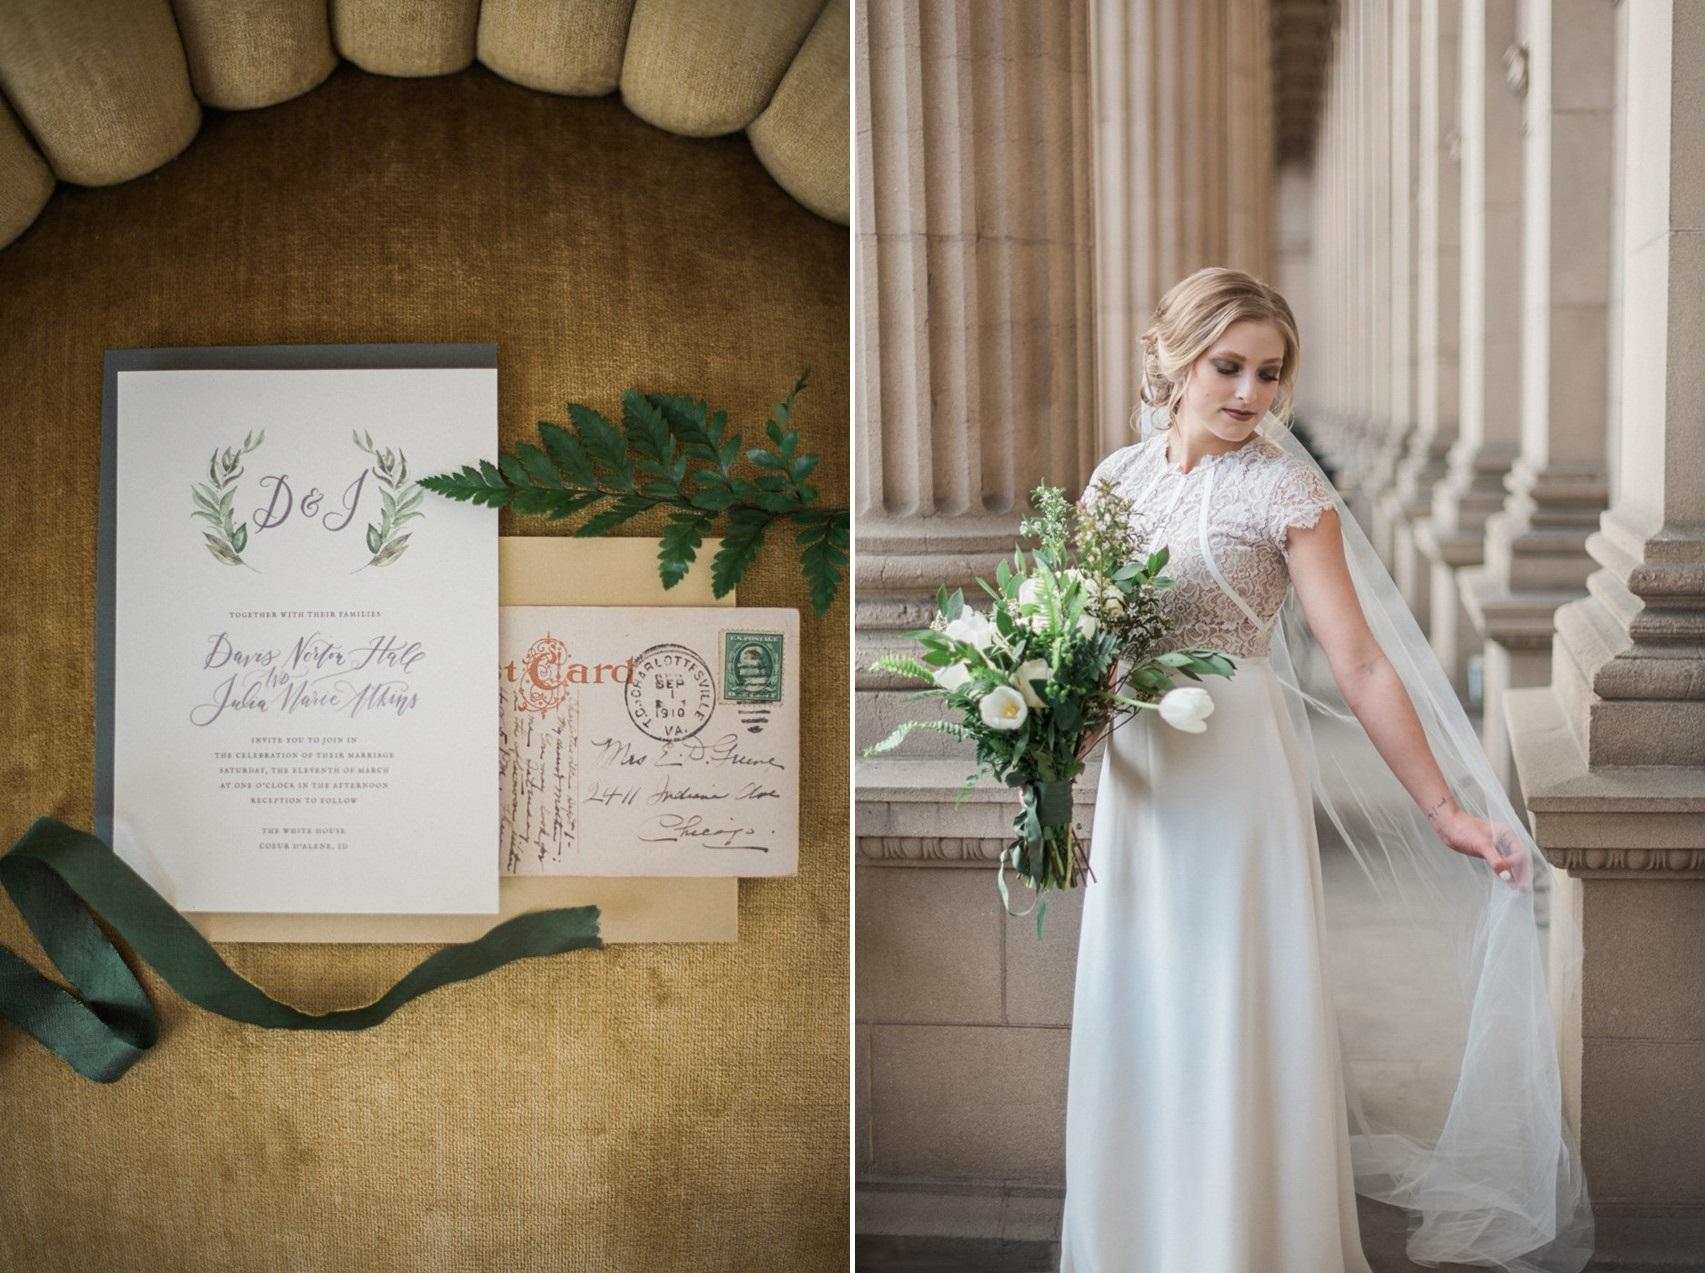 Greenery Vintage Wedding Invite & Bride